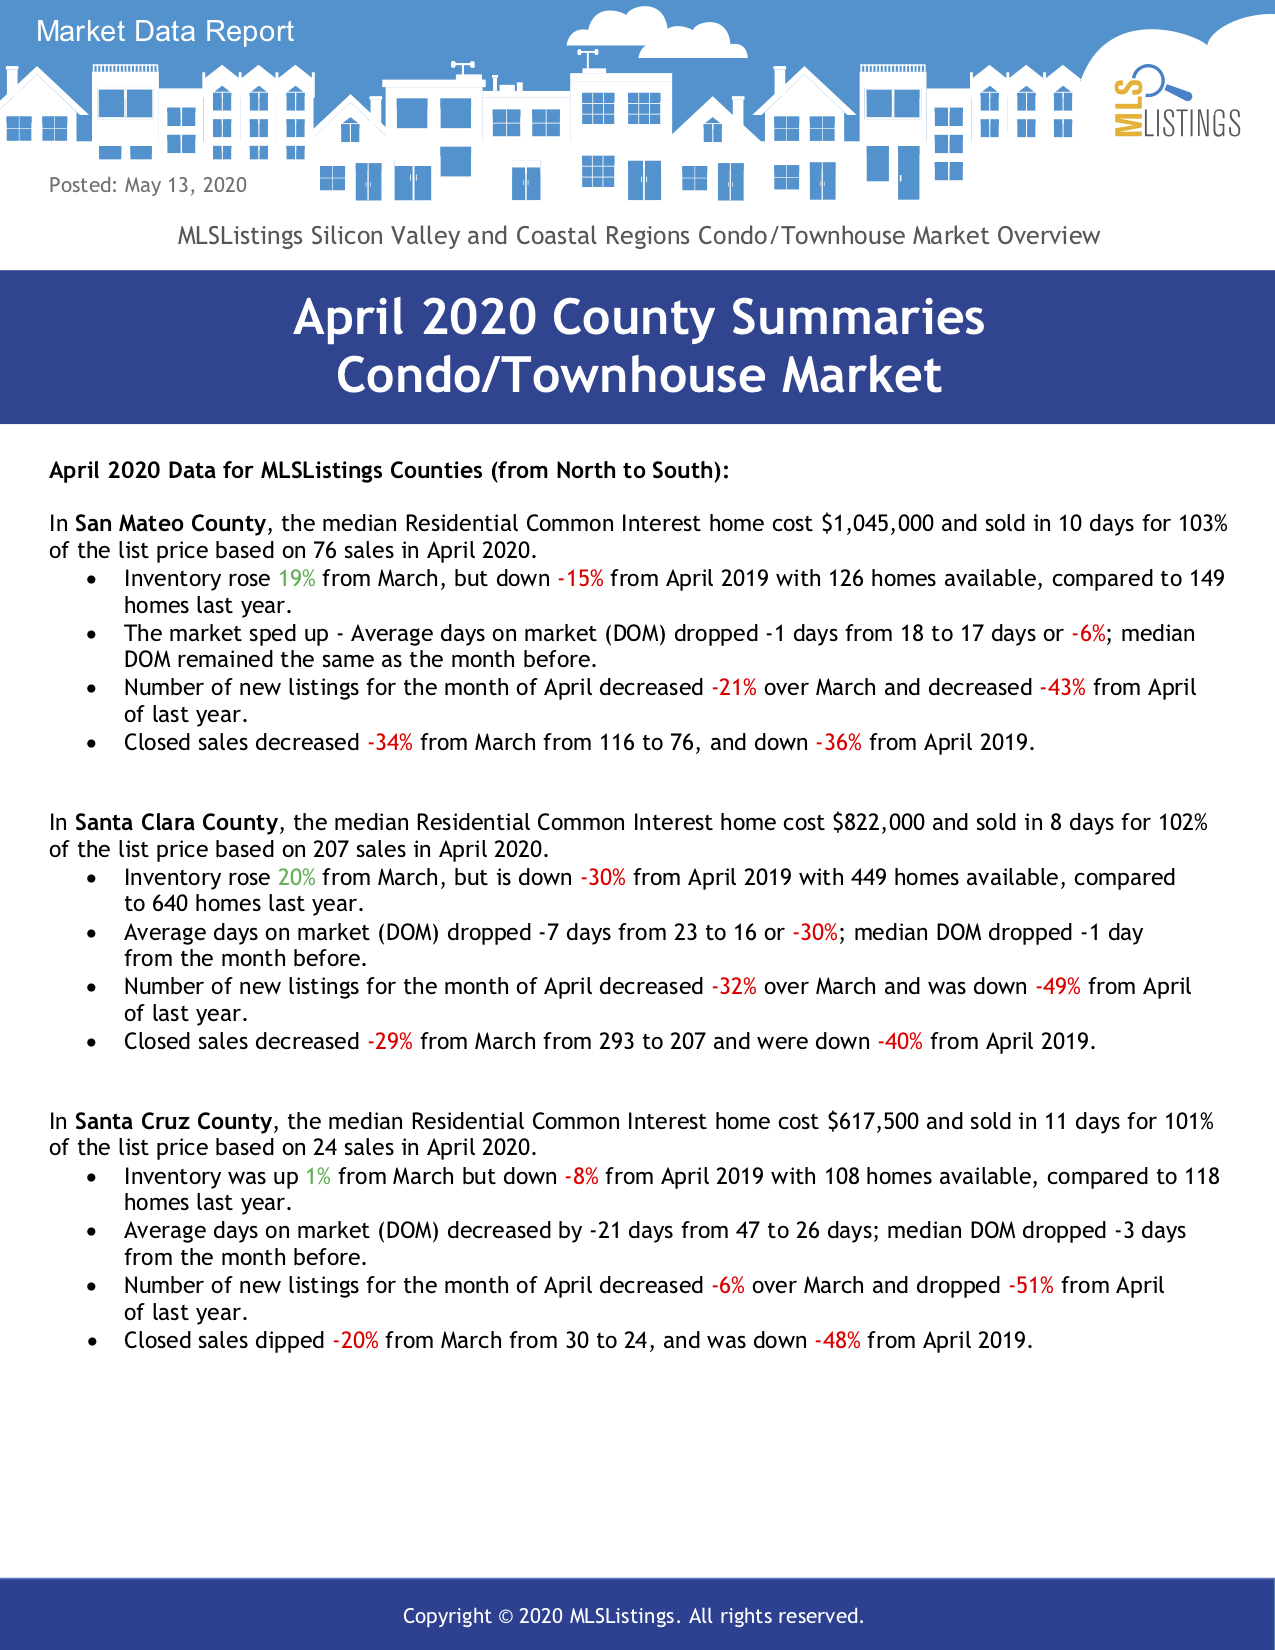 MarketDataReport_Apr2020_051320